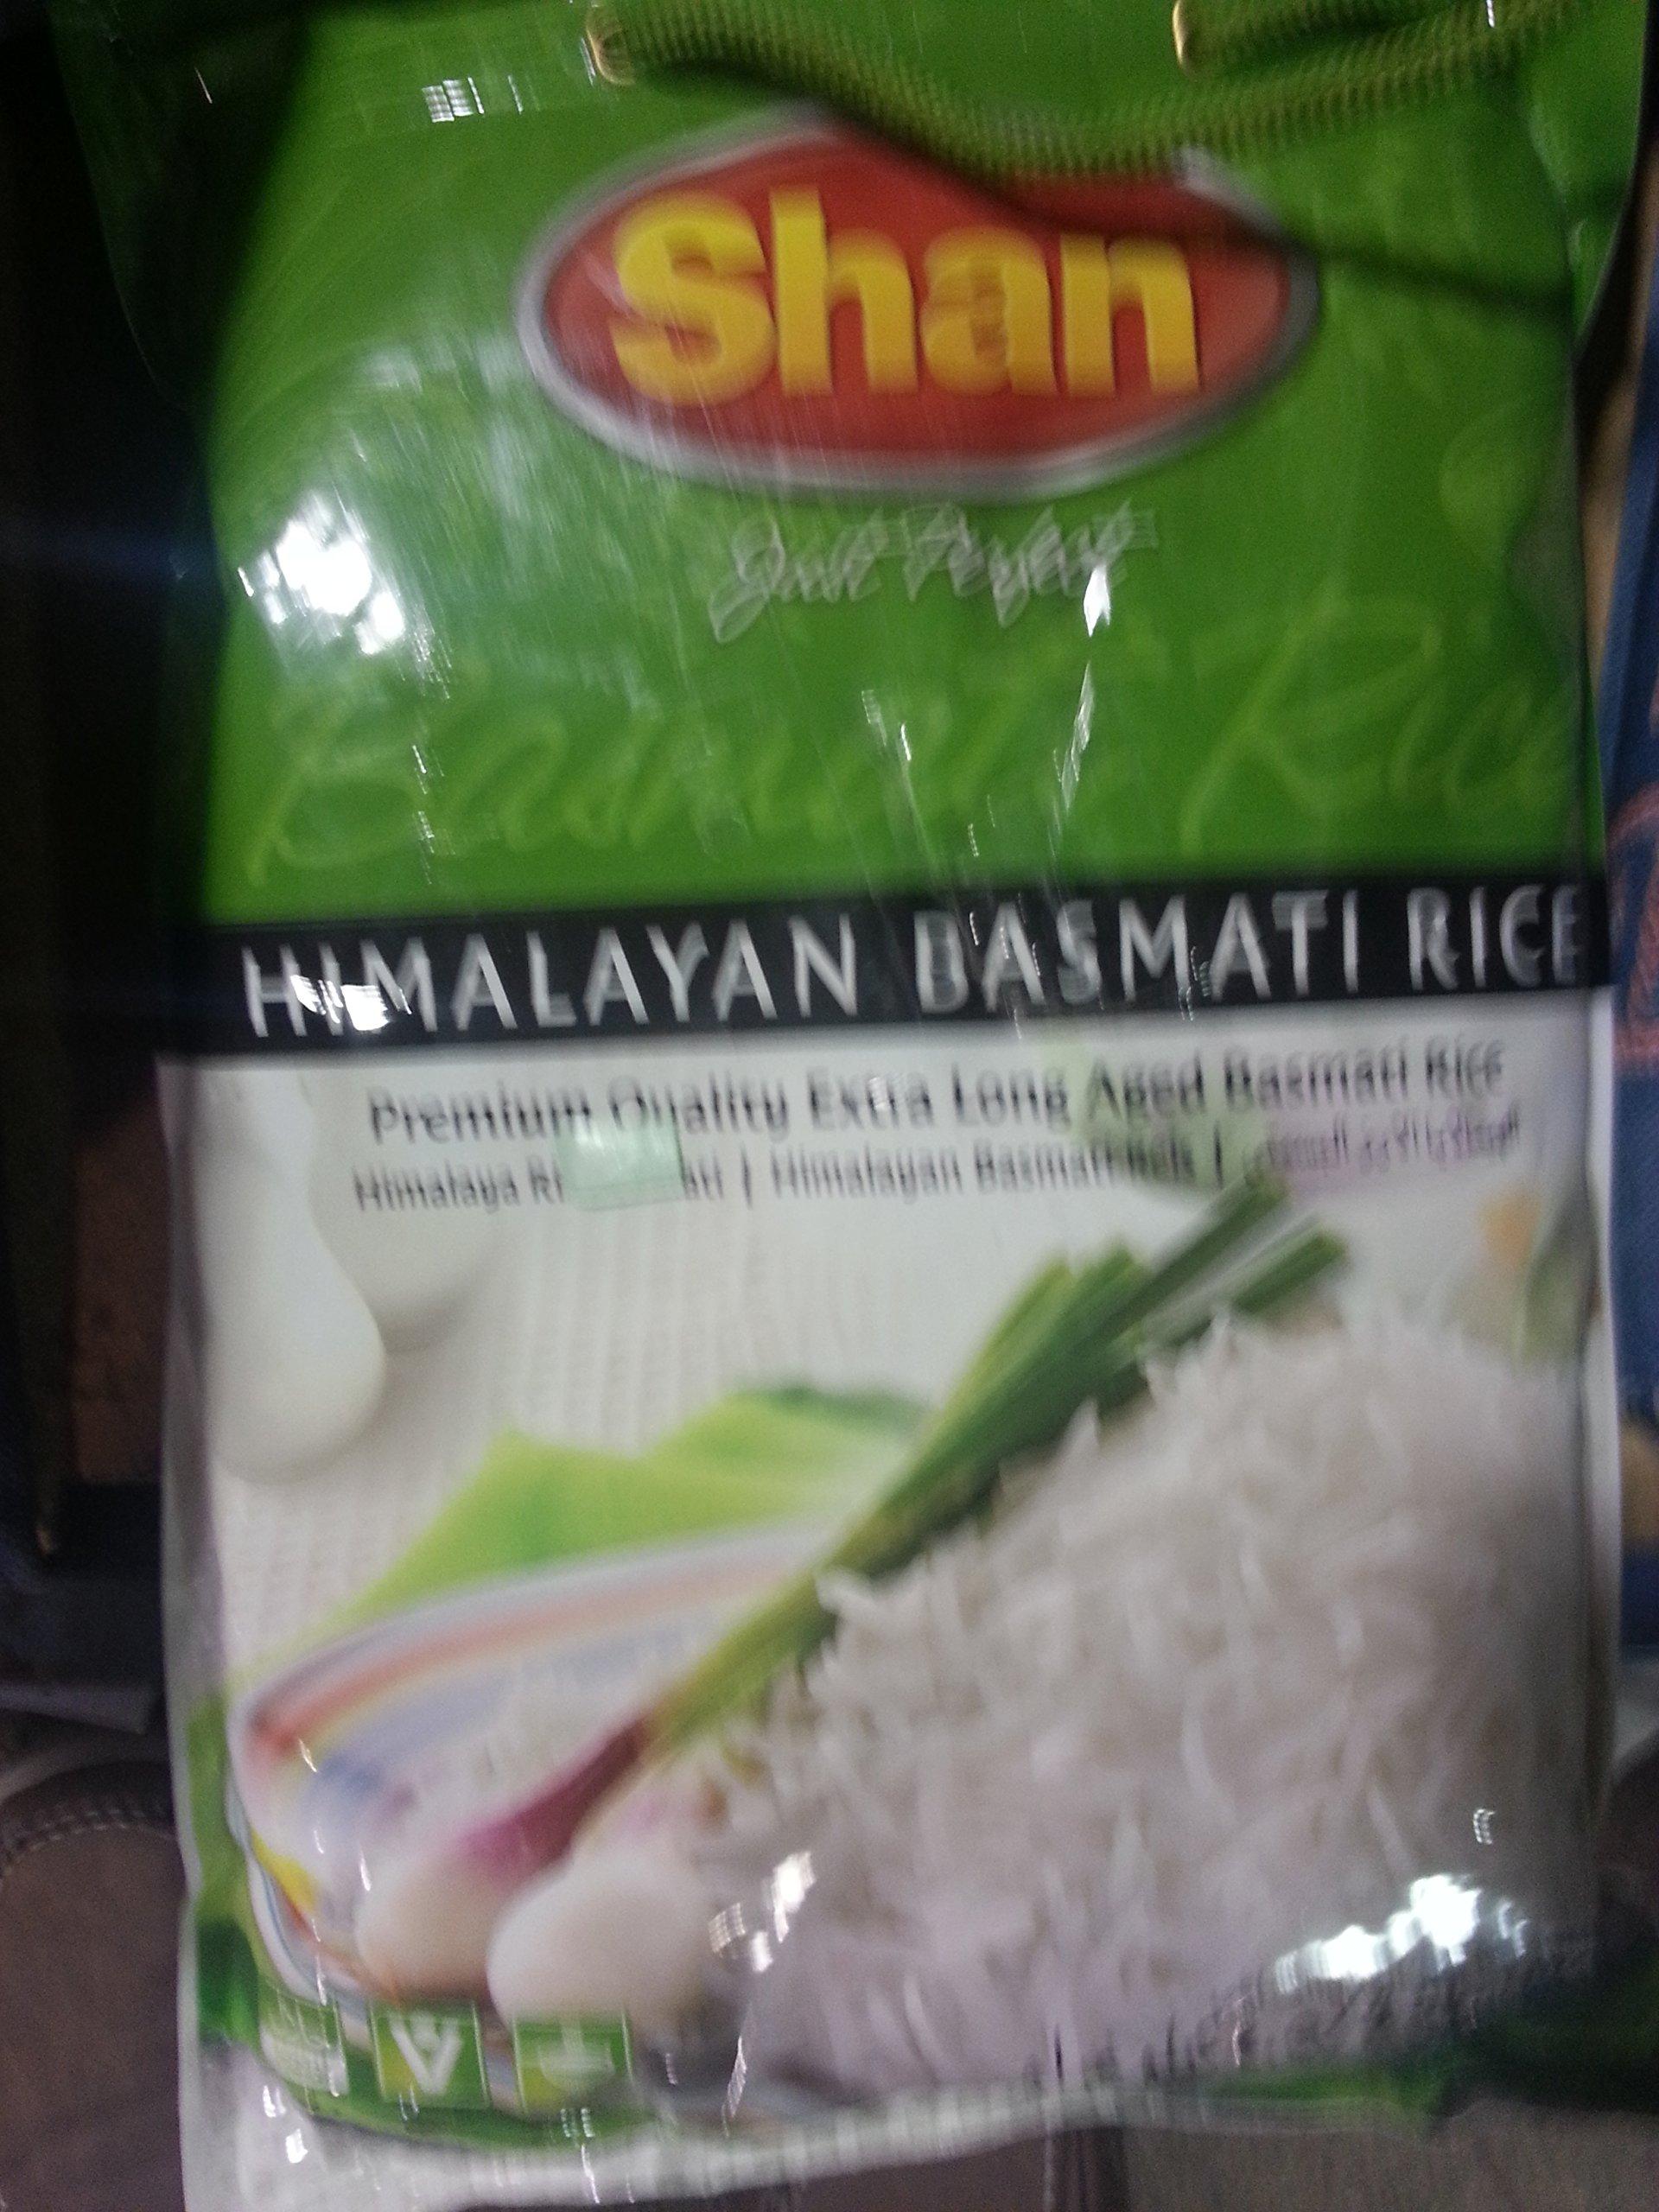 Shan Himalayan Basmati Rice 10 Lb